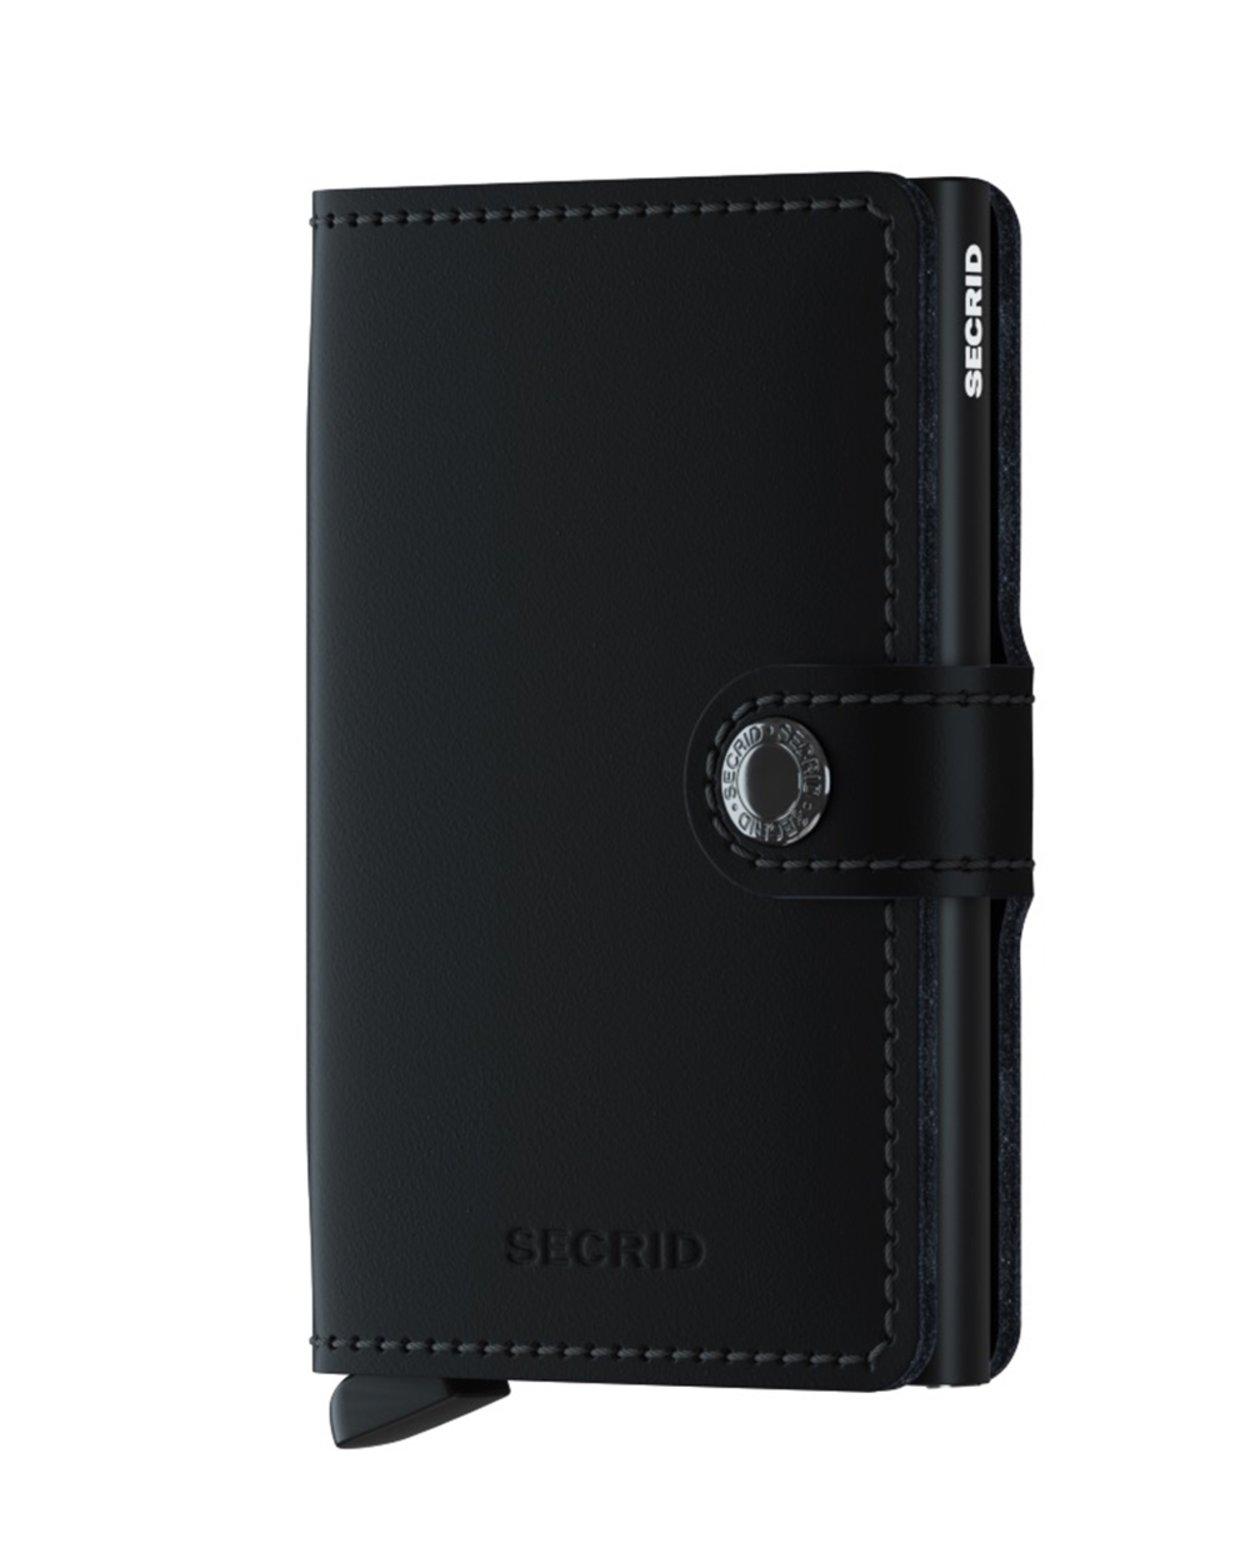 Matte Leather Mini Wallet - Black